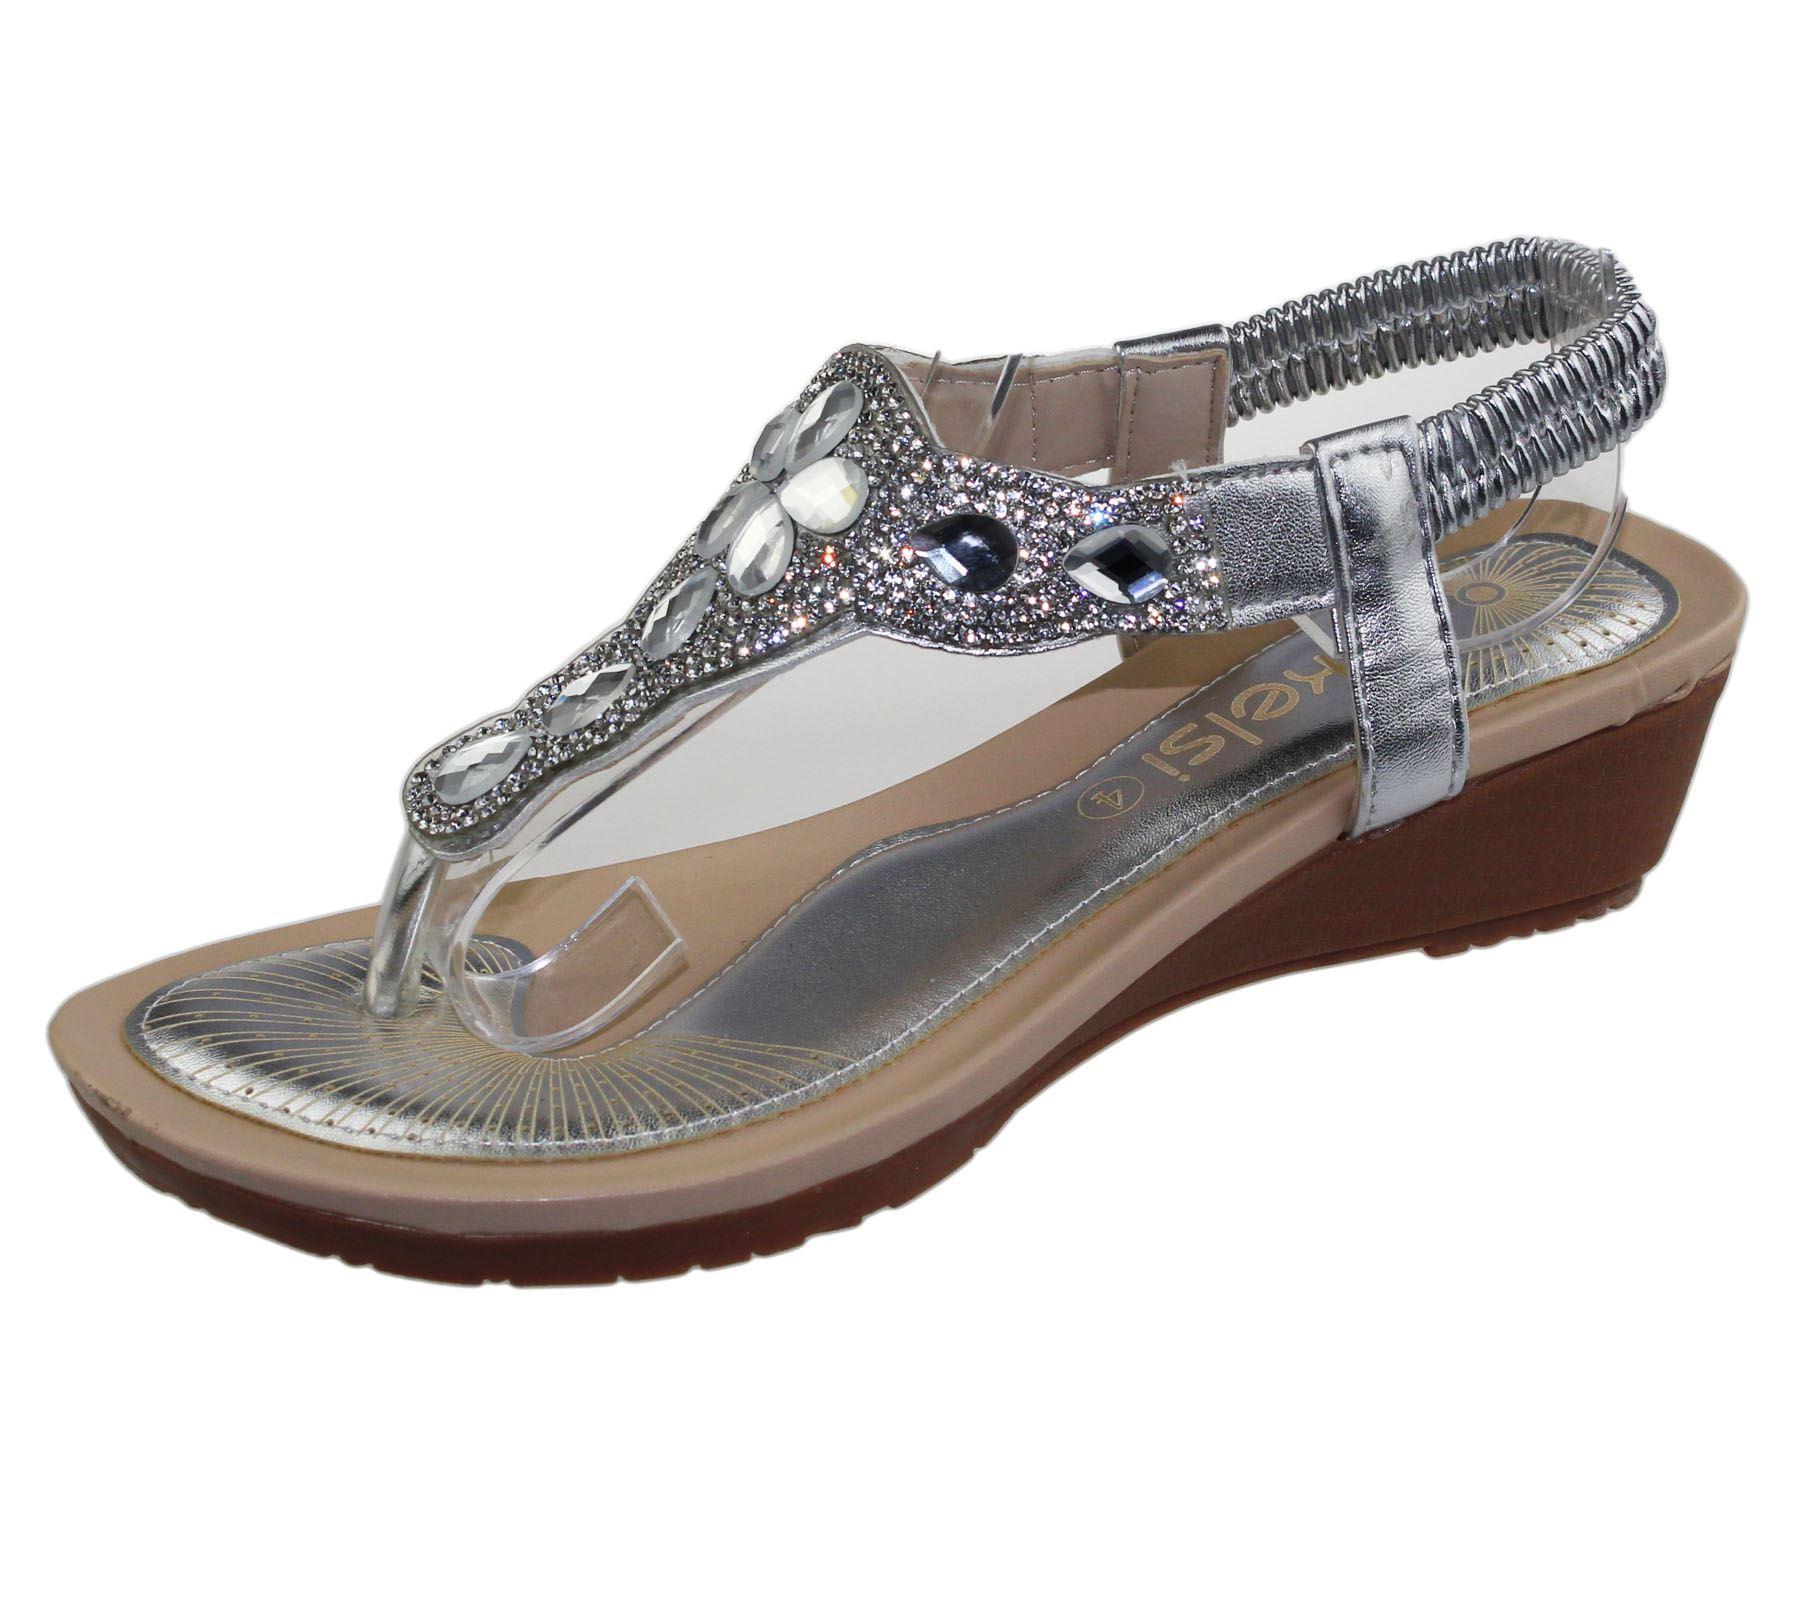 beach wedding shoes Womens Wedge Heel Sandals Ladies Diamante Toe Post Summer Beach Wedding Shoes